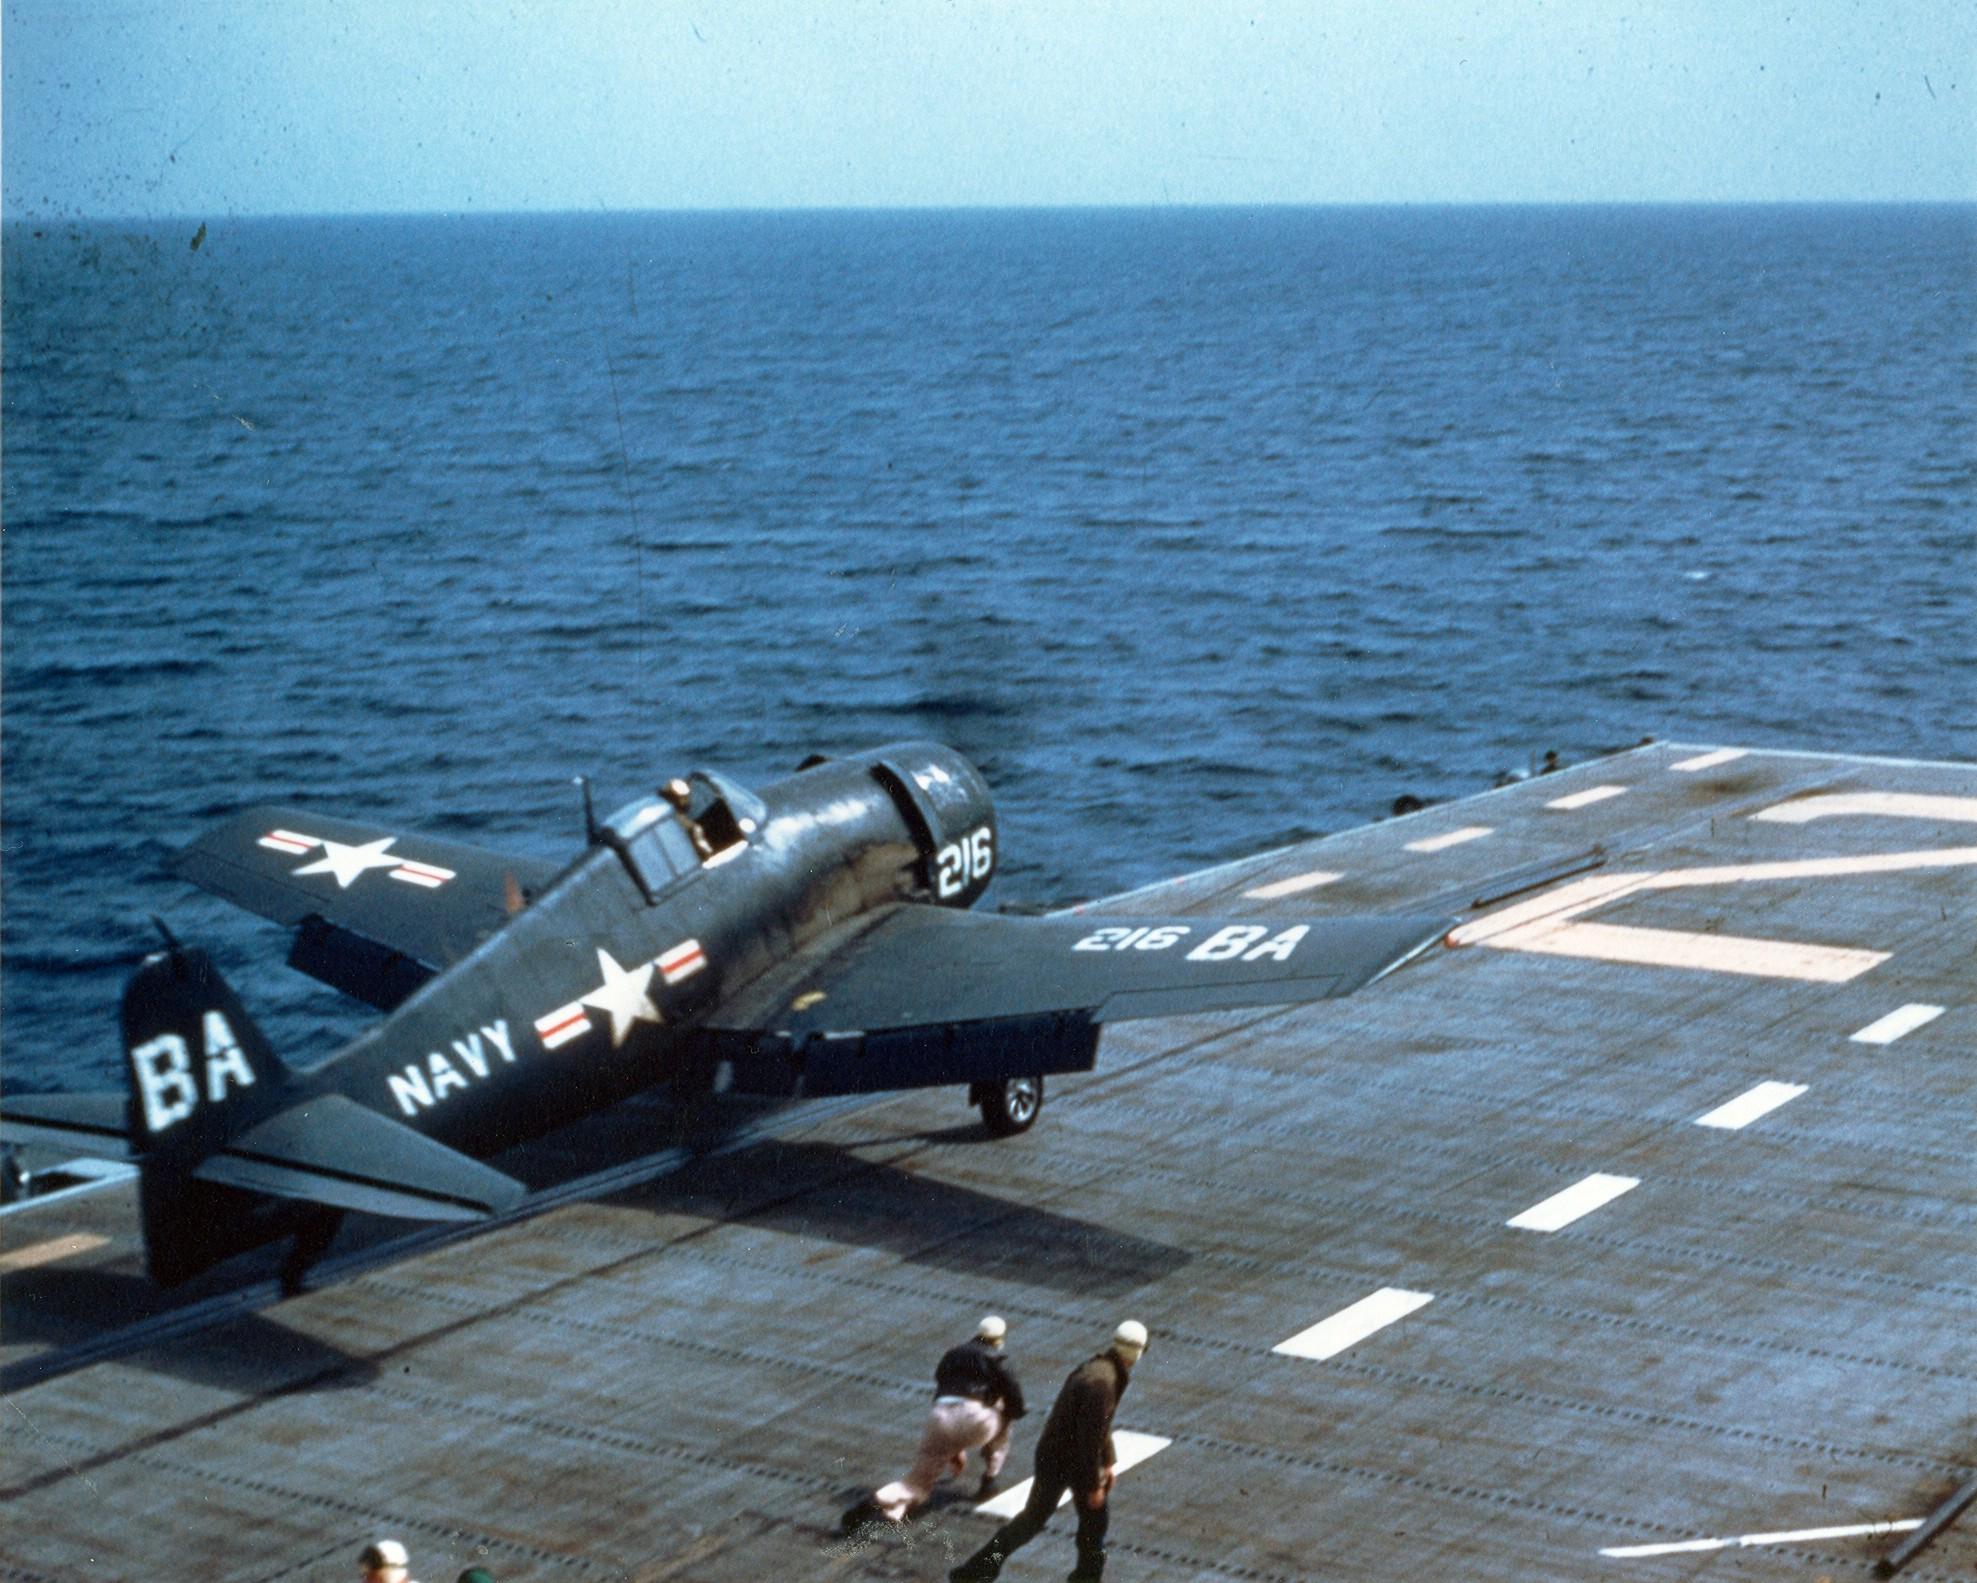 http://upload.wikimedia.org/wikipedia/commons/6/63/F6F-5_launching_from_USS_Monterey_1953.jpg